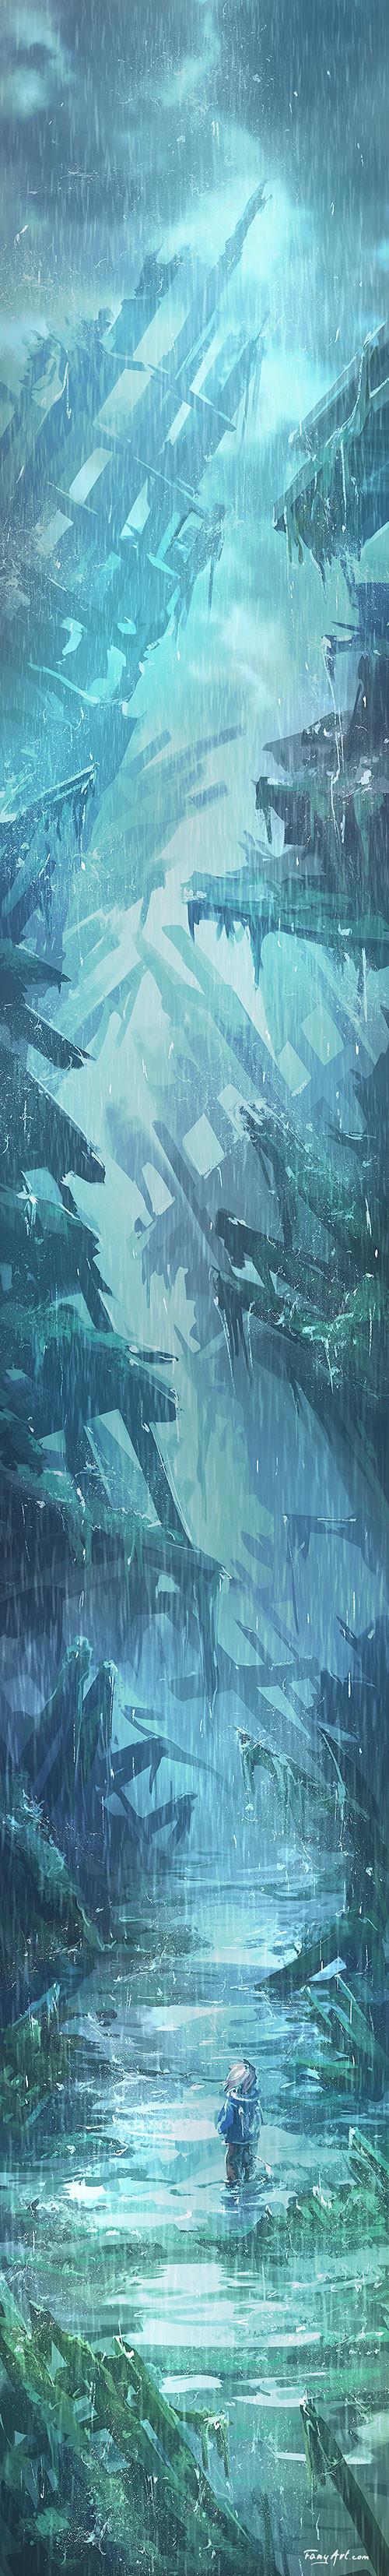 Iva vyhnankova rain2 500